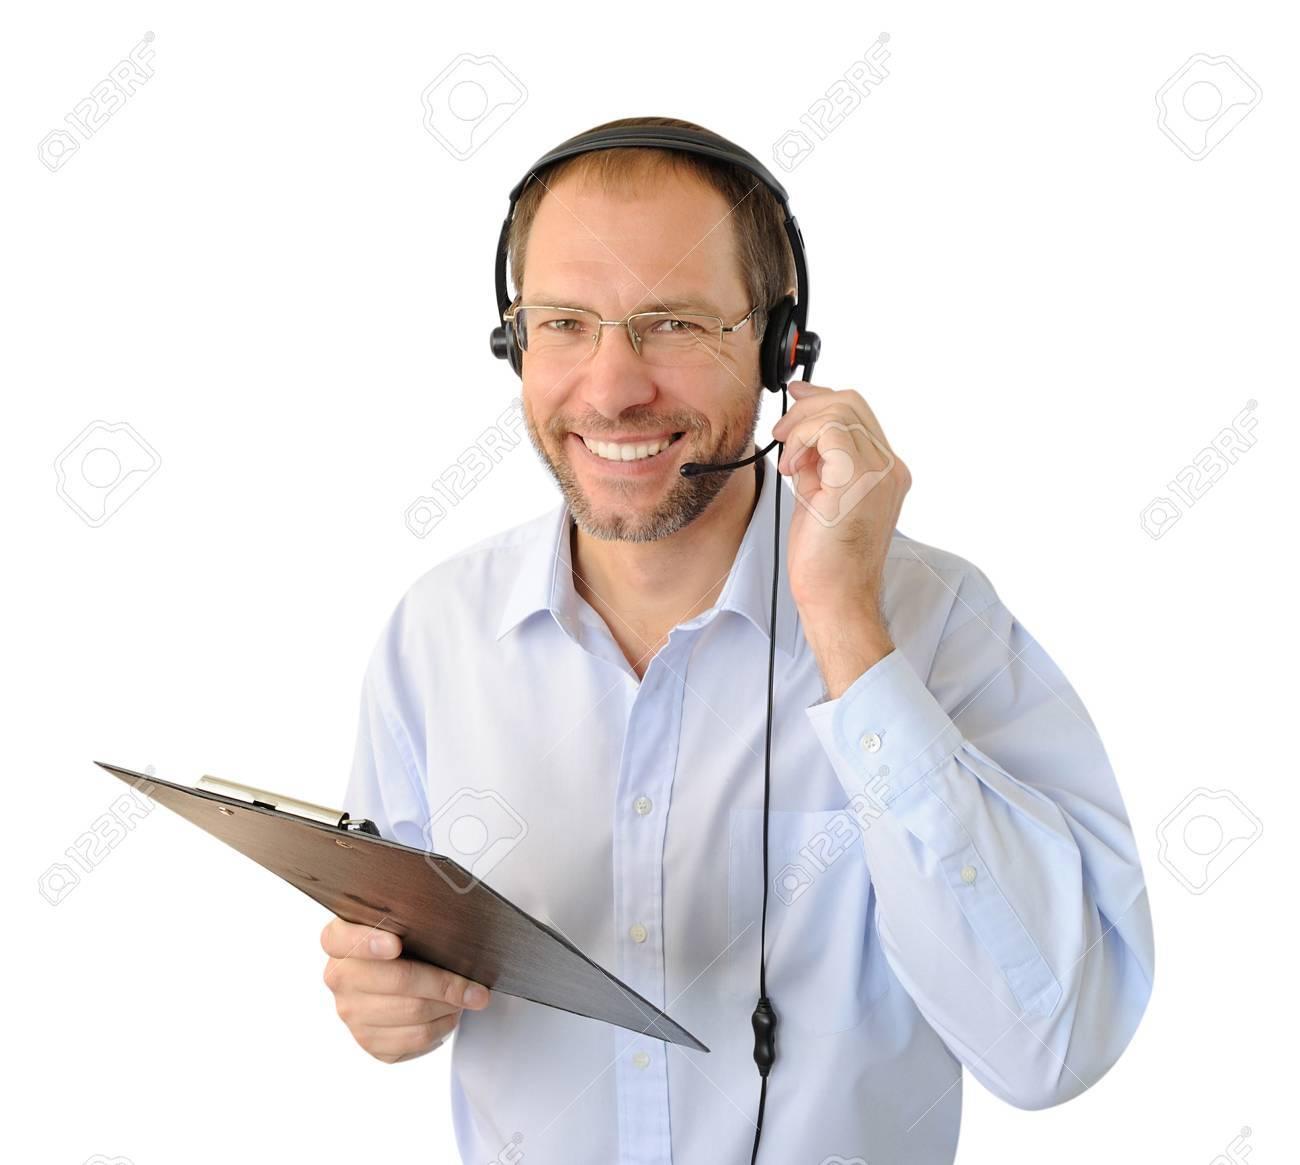 Portrait of phone operator isolated on white background - 16234548